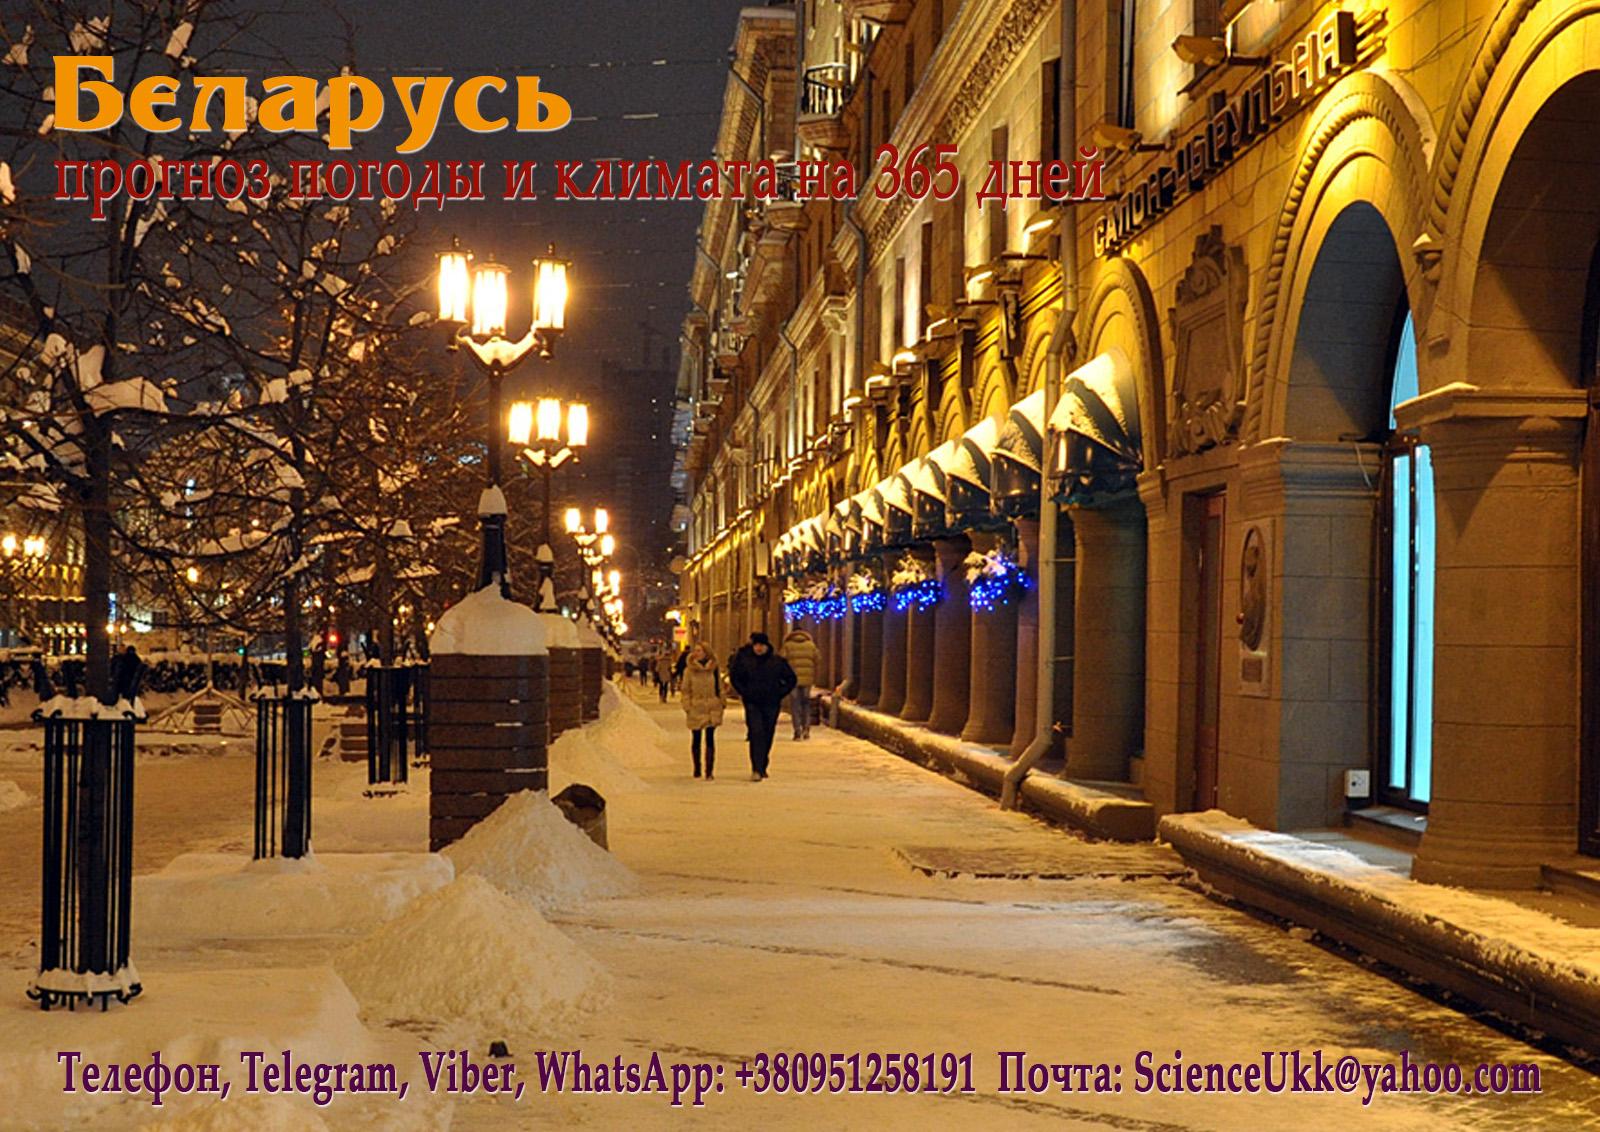 K.Vedomosti-Belarus-1600-2018.07.14-002